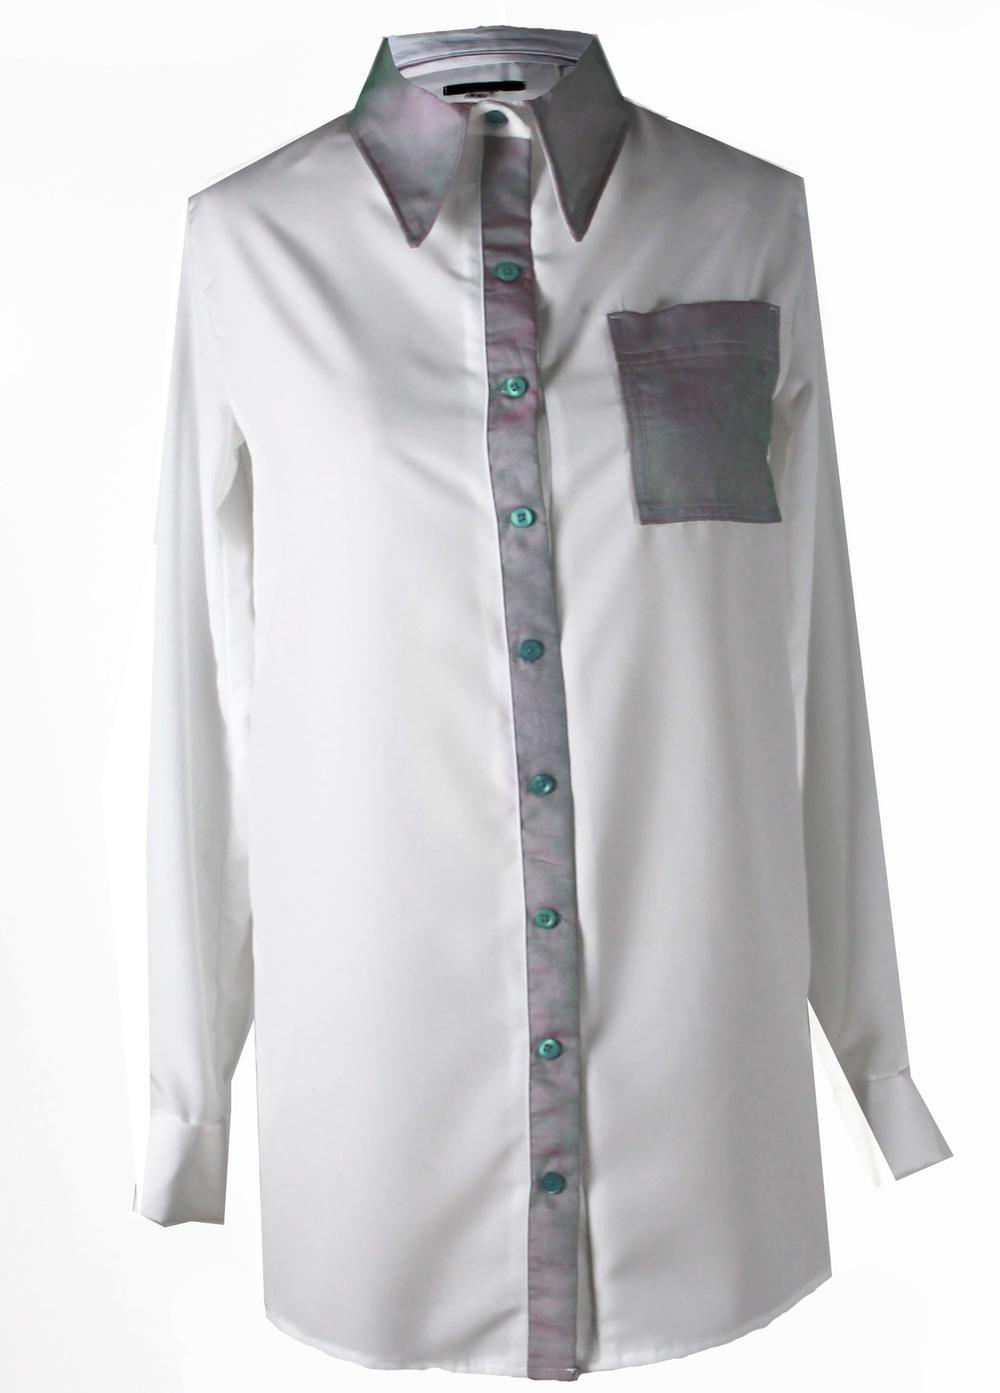 Peachskin Shirt 2.jpg